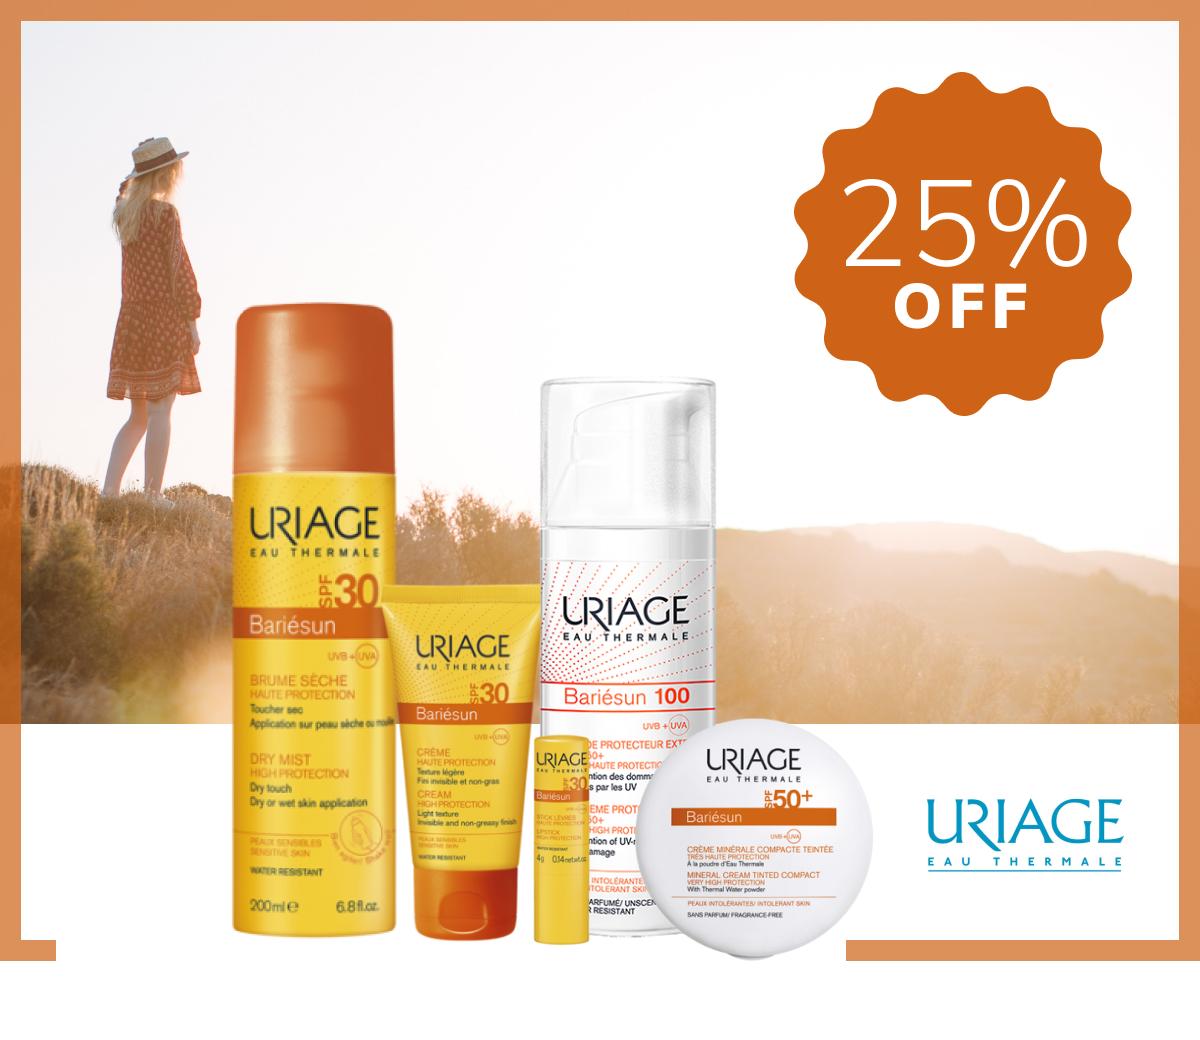 Uriage - Sunscreens